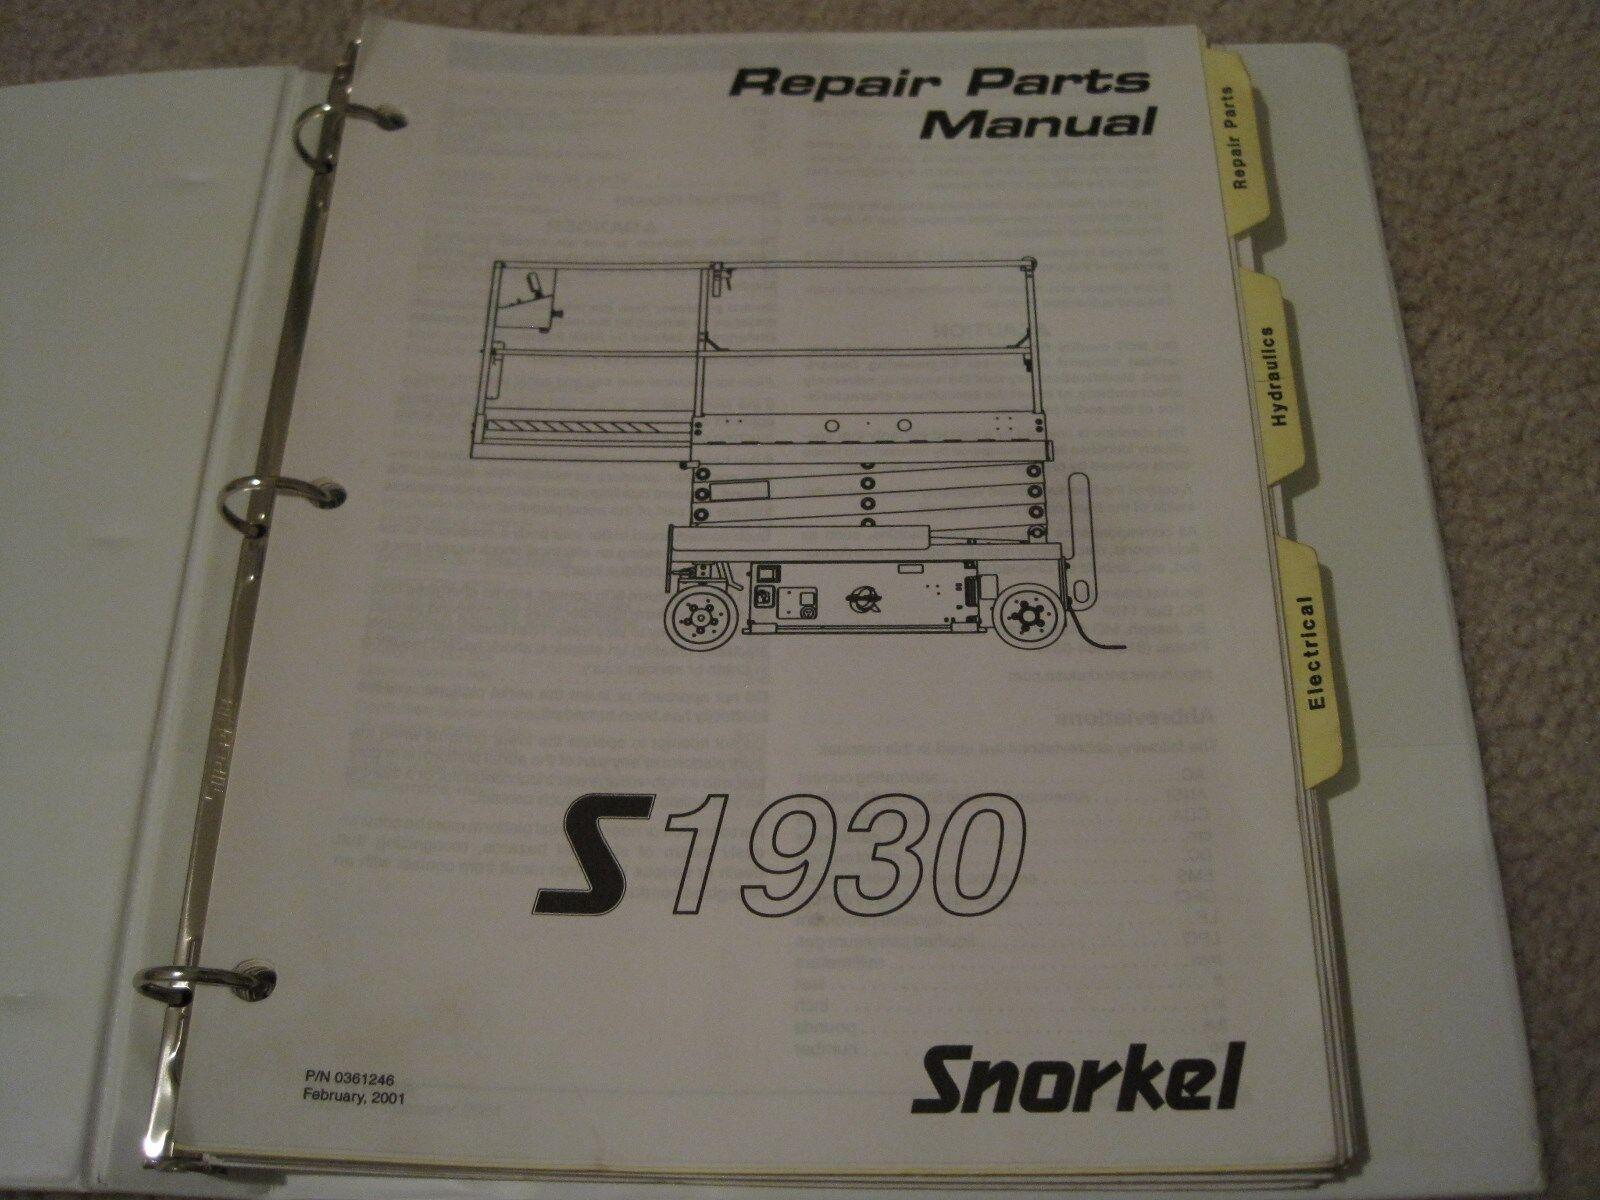 Snorkel Lift Tb42 Wiring Diagram Electrical Diagrams Parts Schematic Diy Enthusiasts U2022 Devilbiss Air Compressor